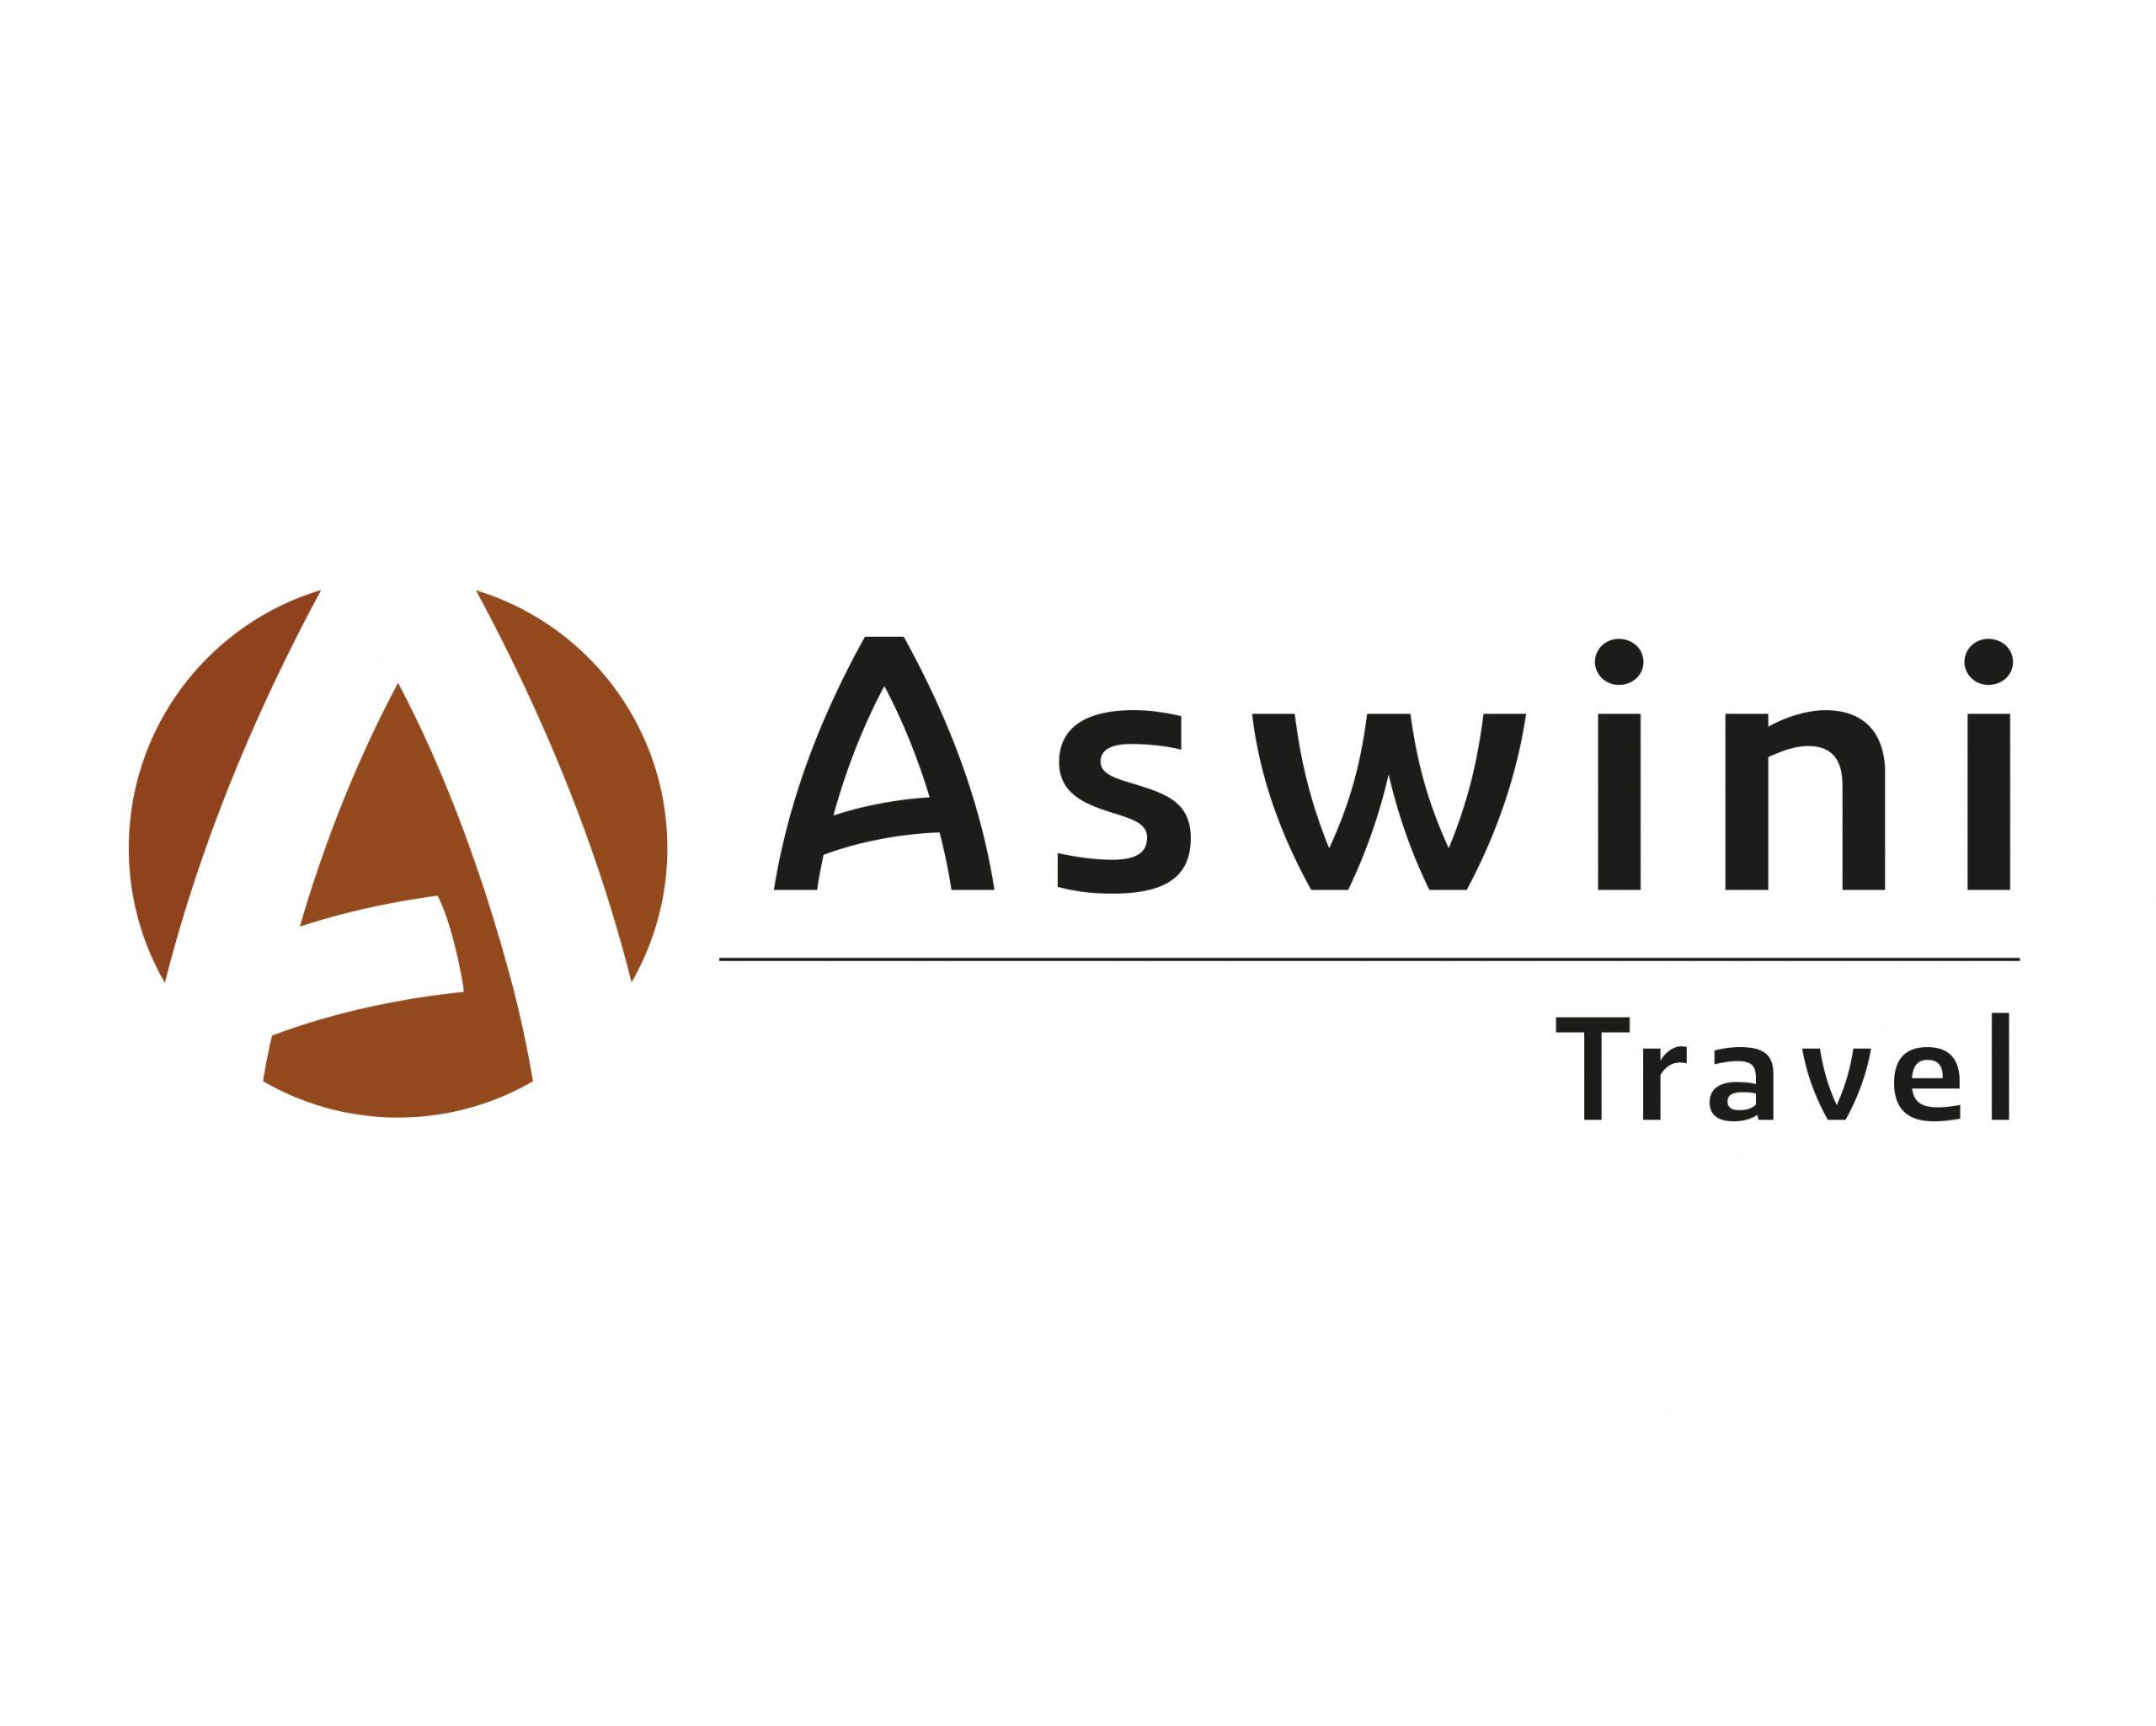 Aswini Travel